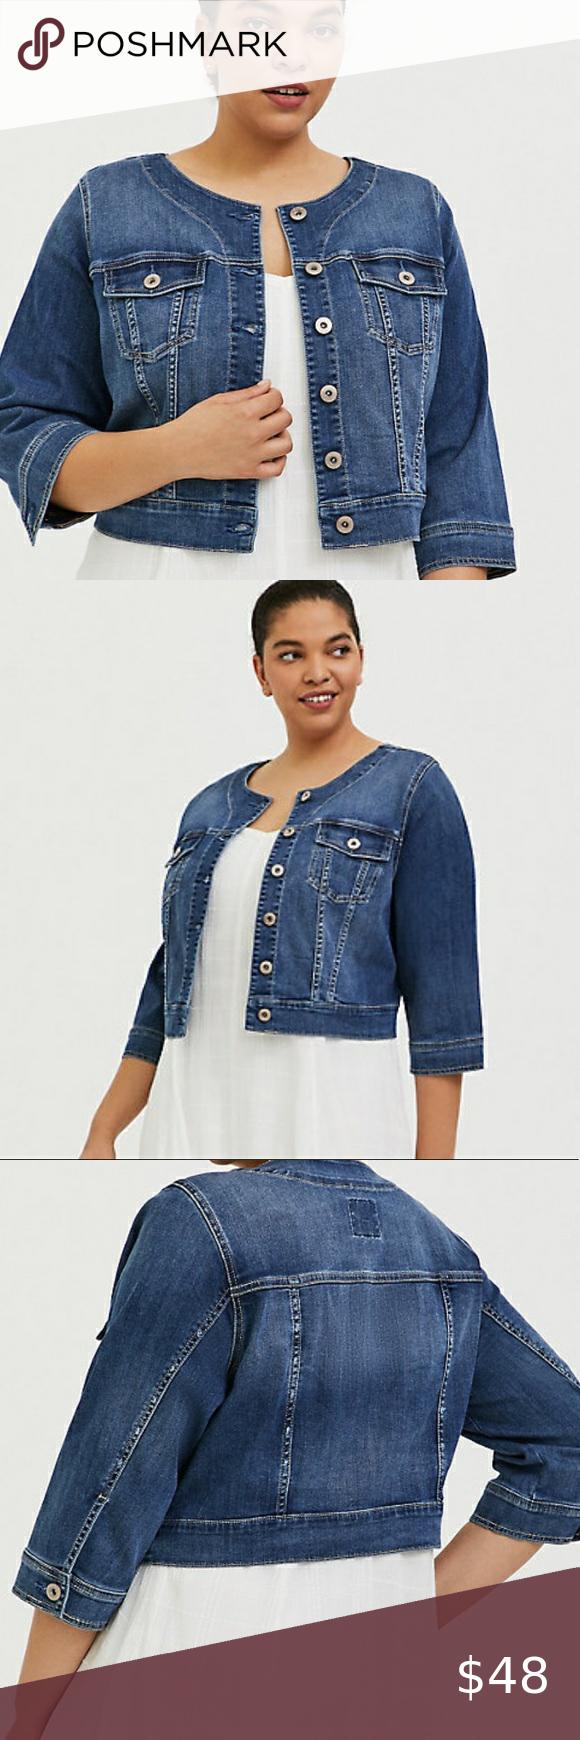 Torrid Collarless Jean Jacket Nwt Size 3x Collarless Jean Jacket Jackets [ 1740 x 580 Pixel ]